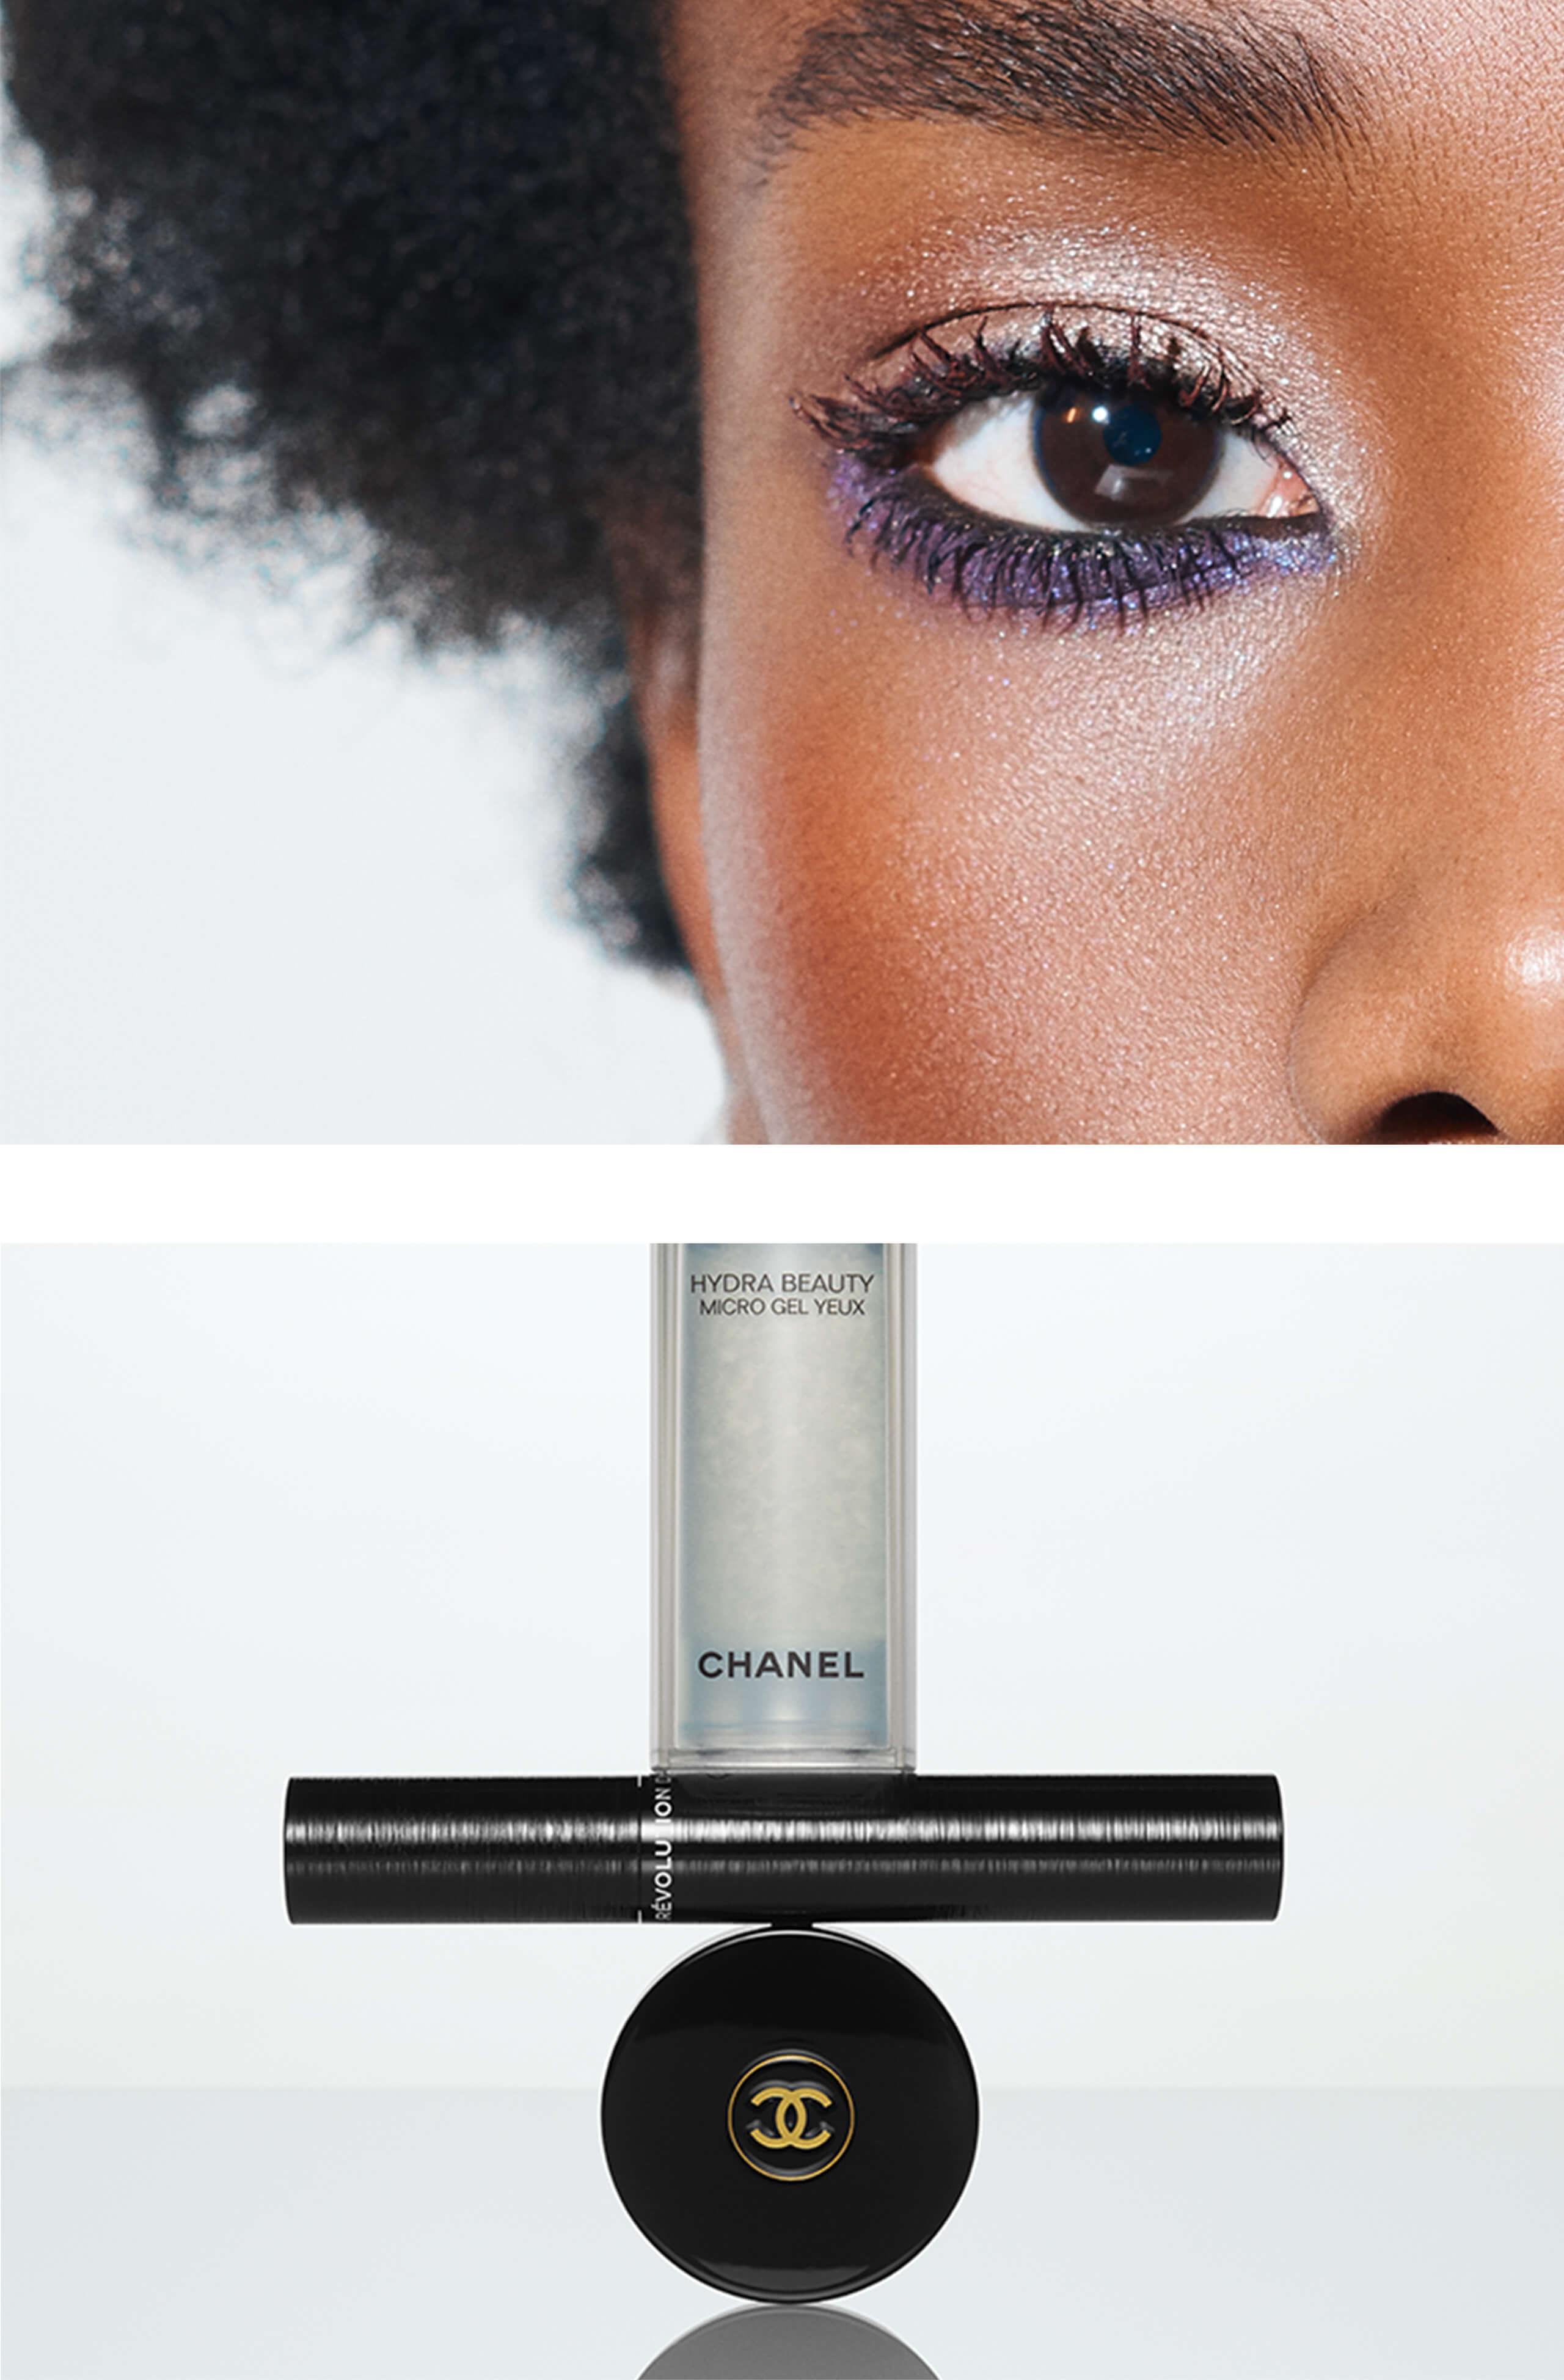 Violet Vibes Eye Makeup Look - Chanel